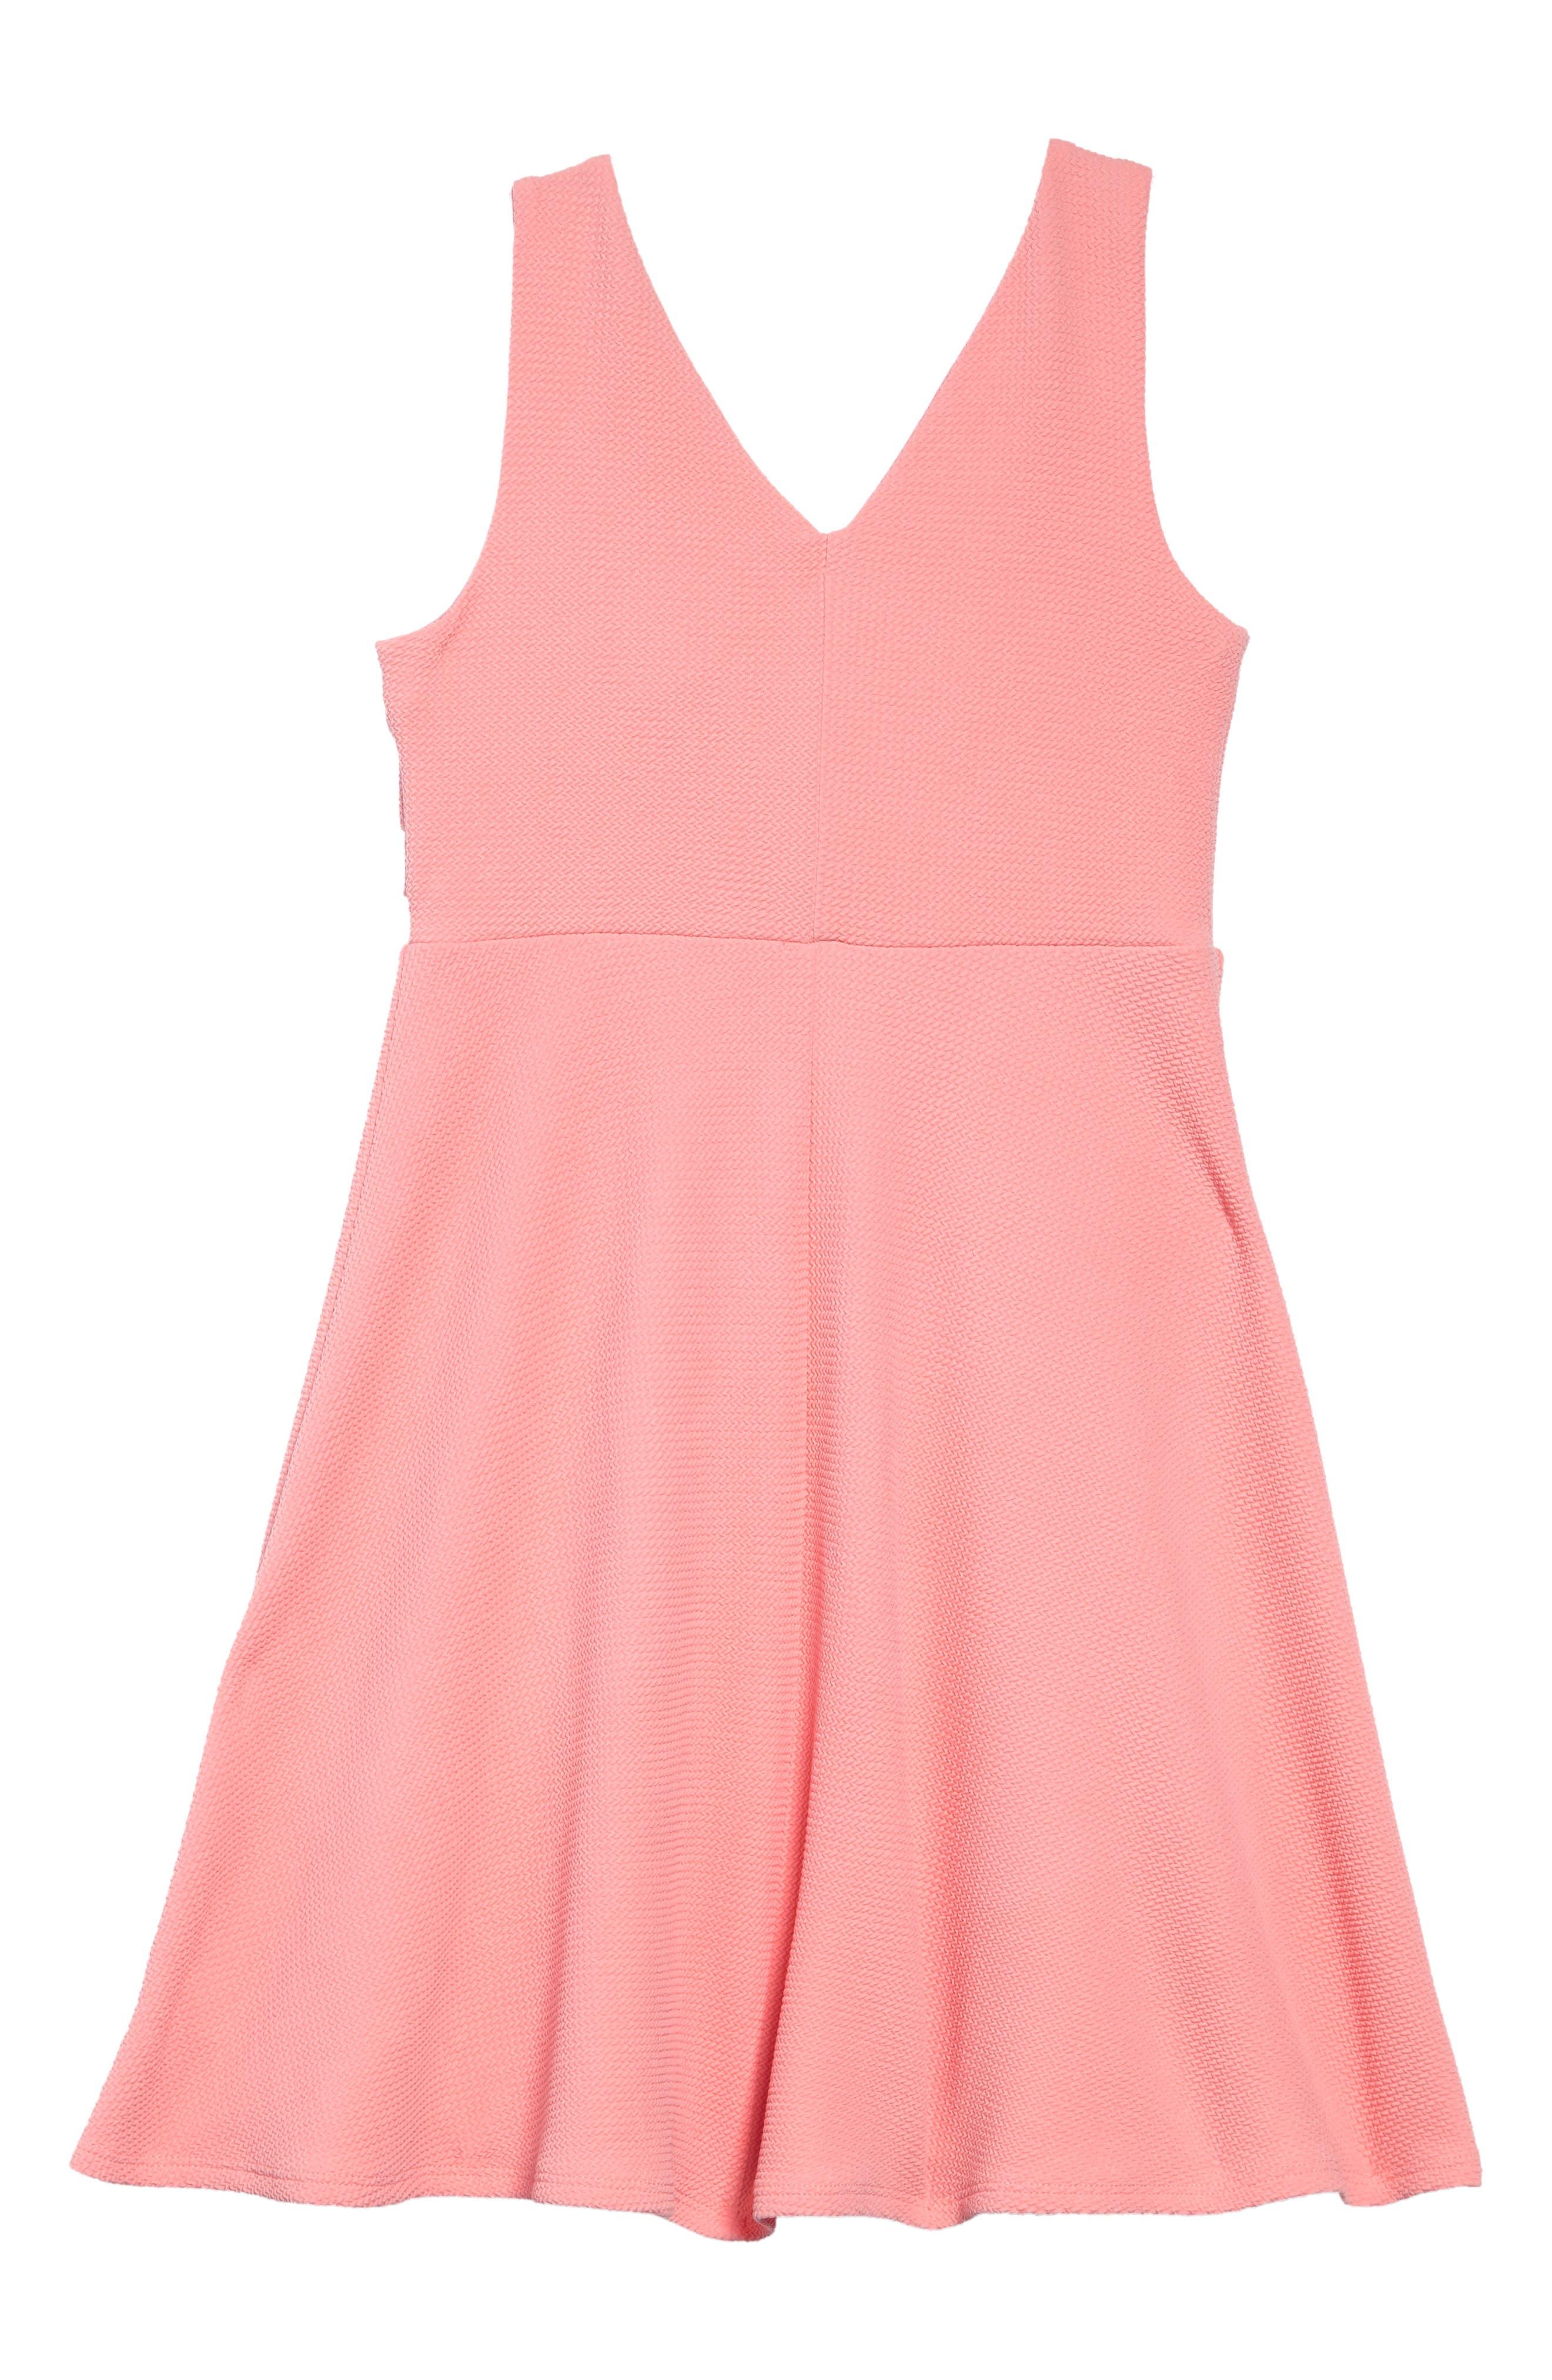 Double Ruffle Dress,                             Alternate thumbnail 2, color,                             PEACH